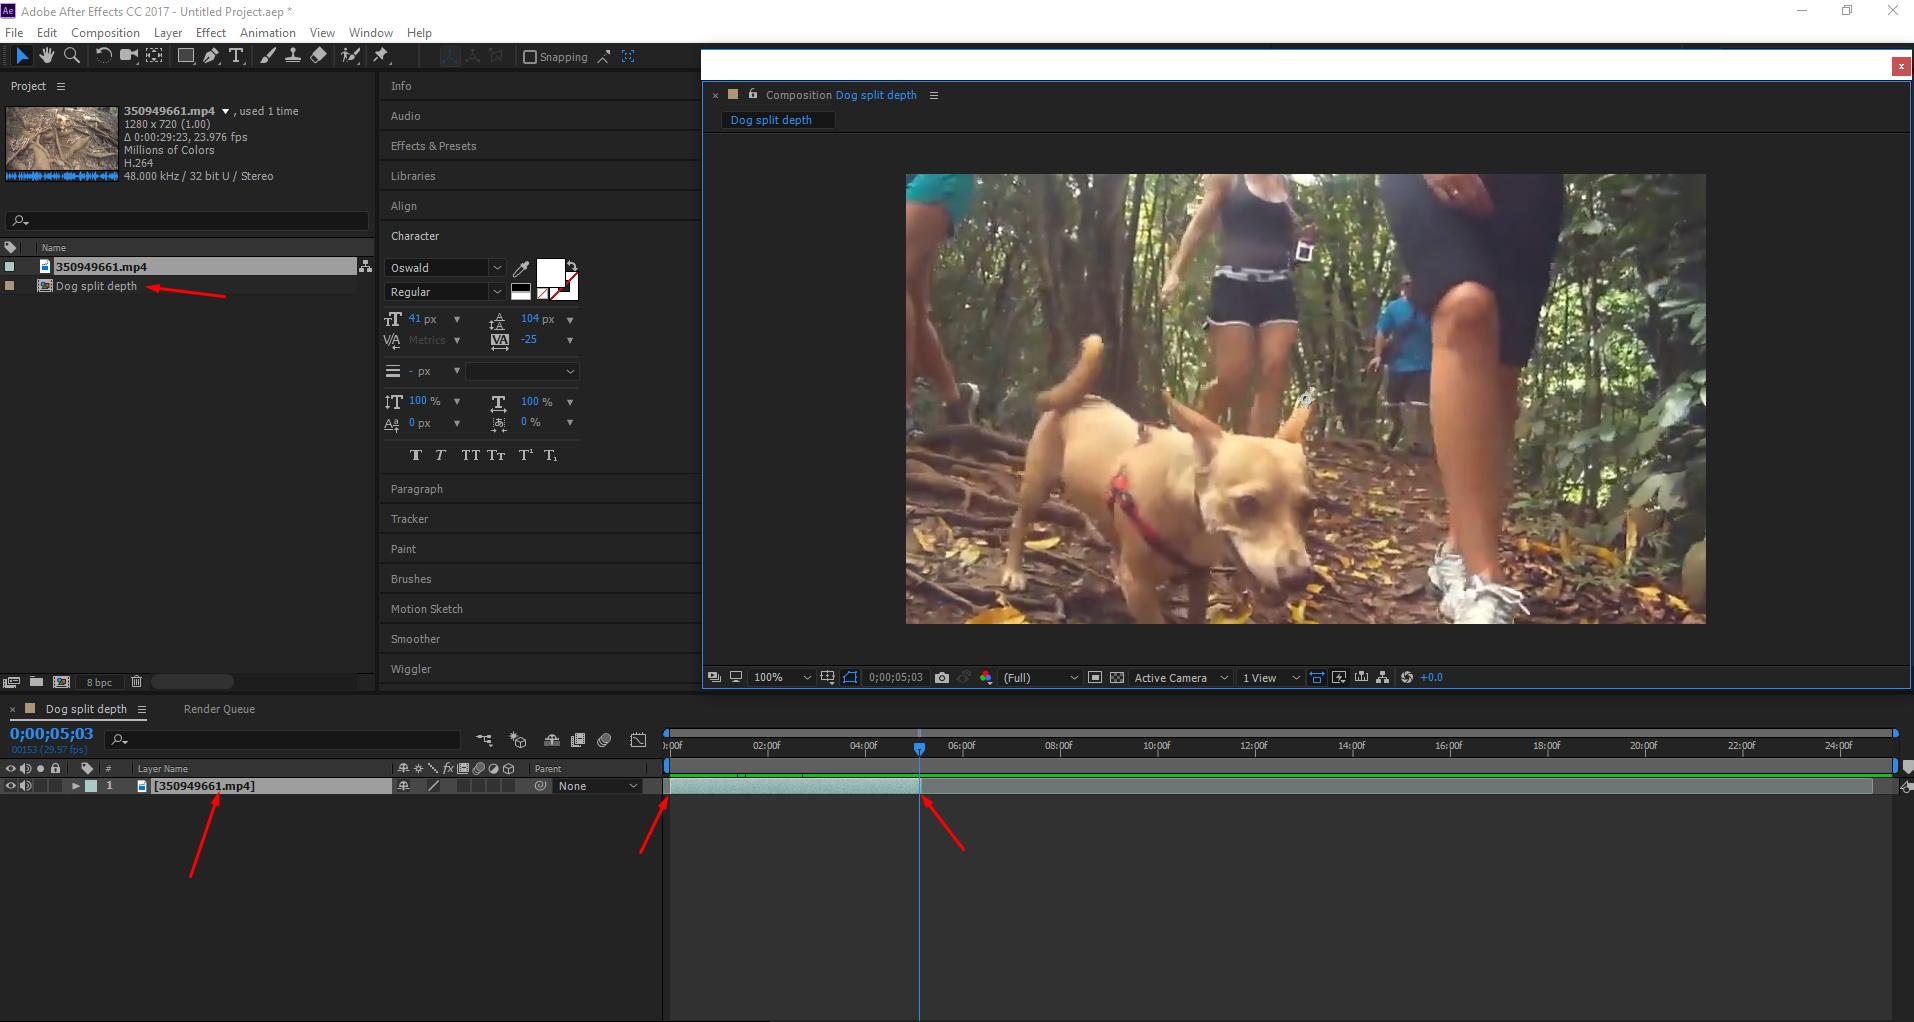 Make a new composition and shorten the clip